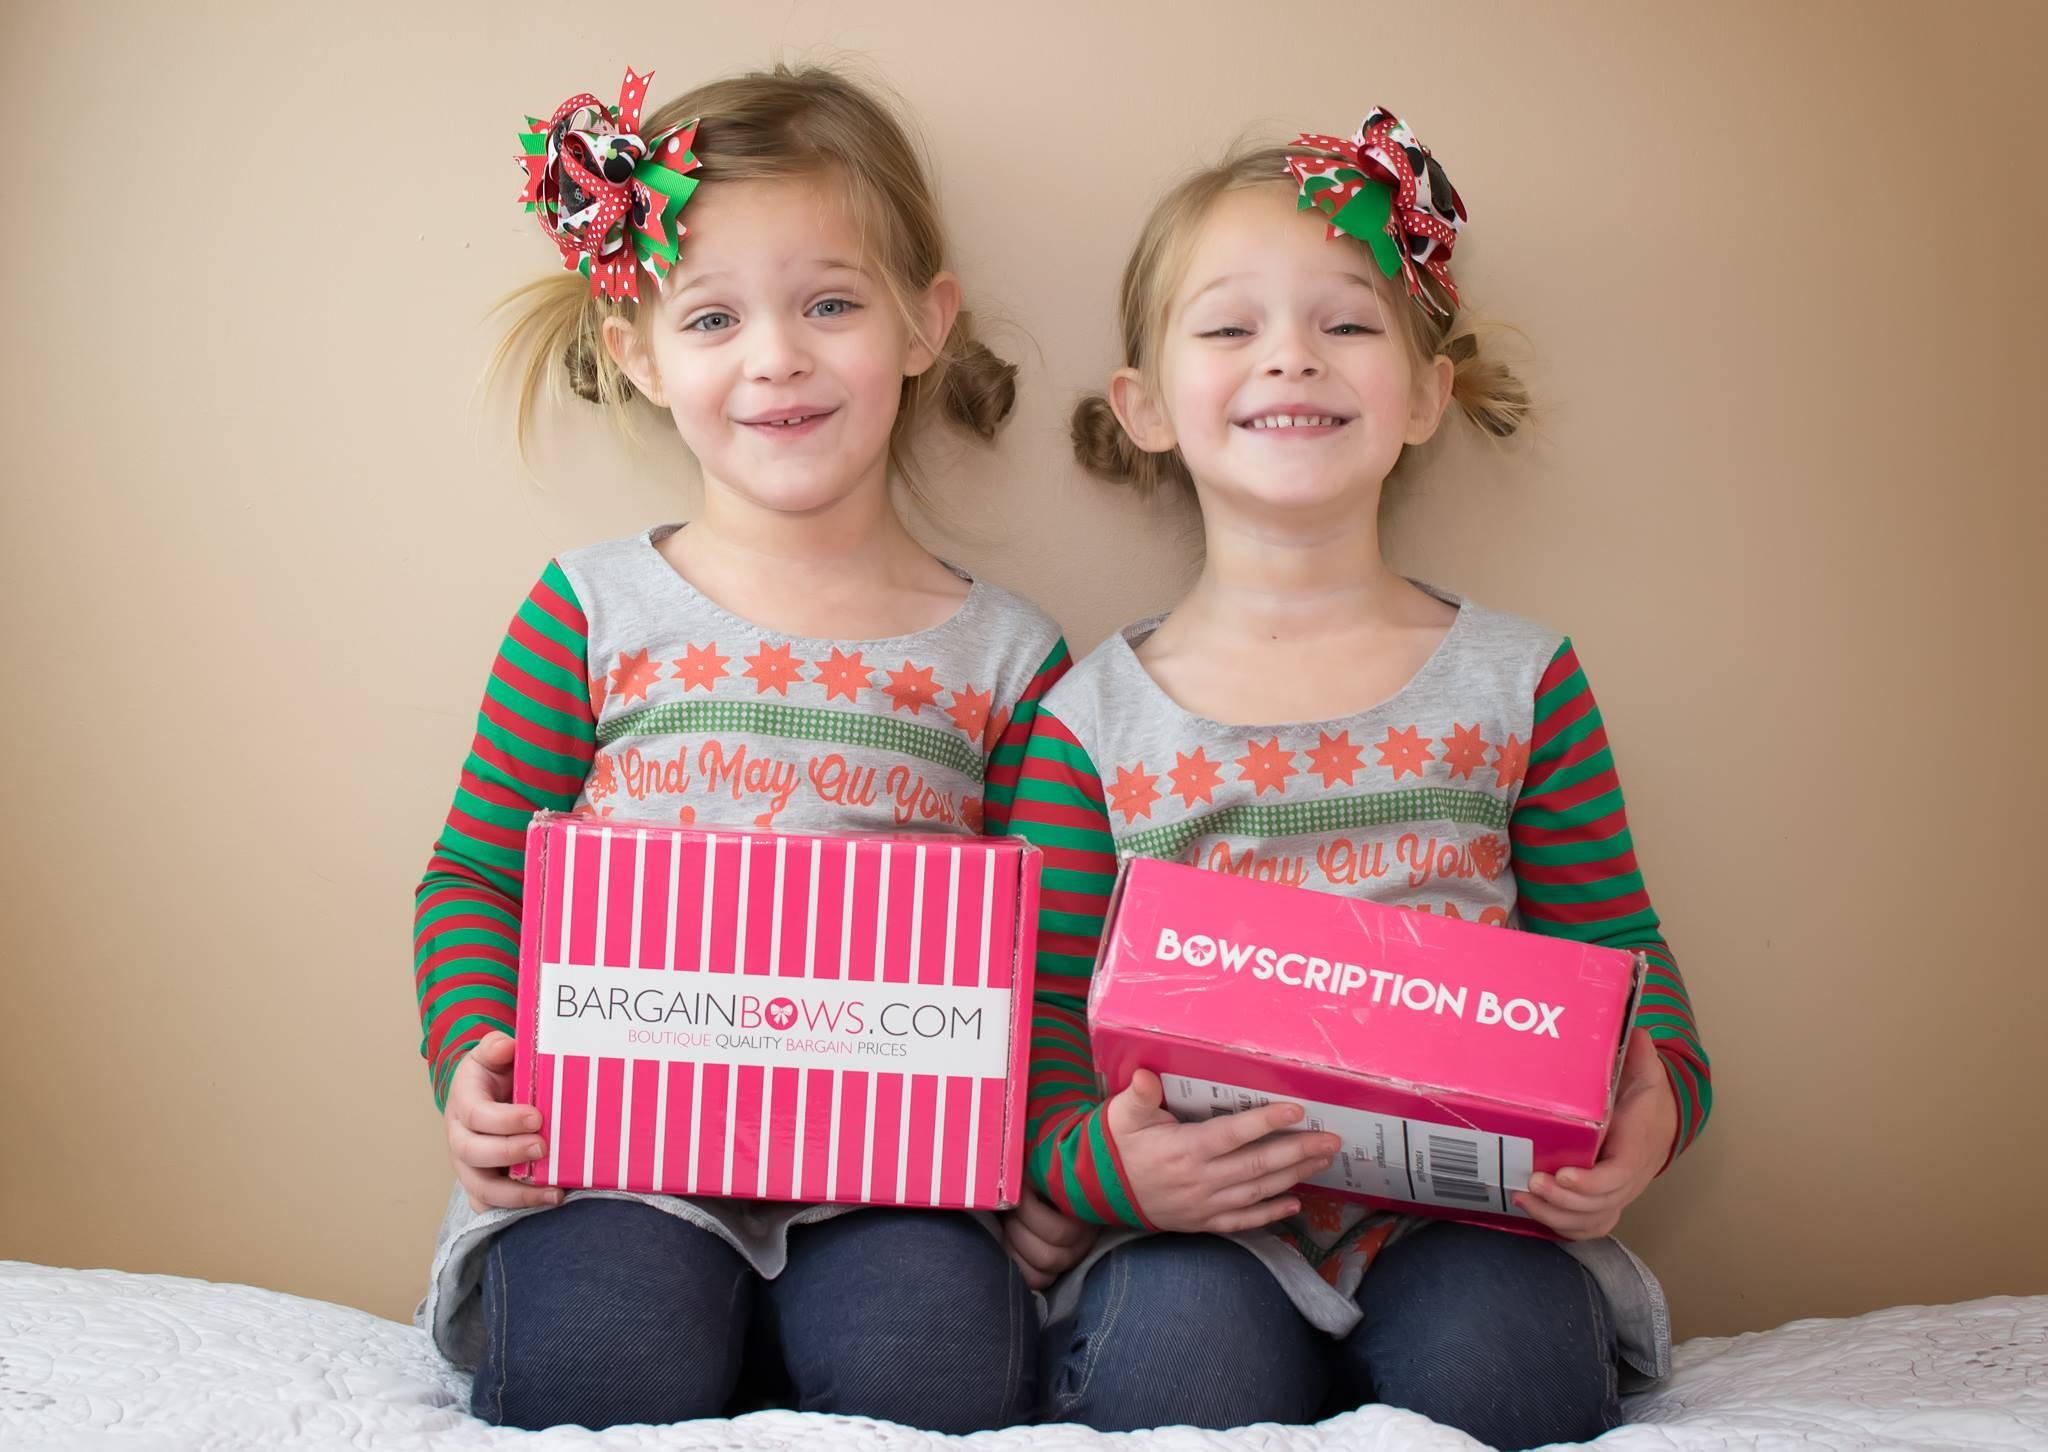 Bowscription Box Models